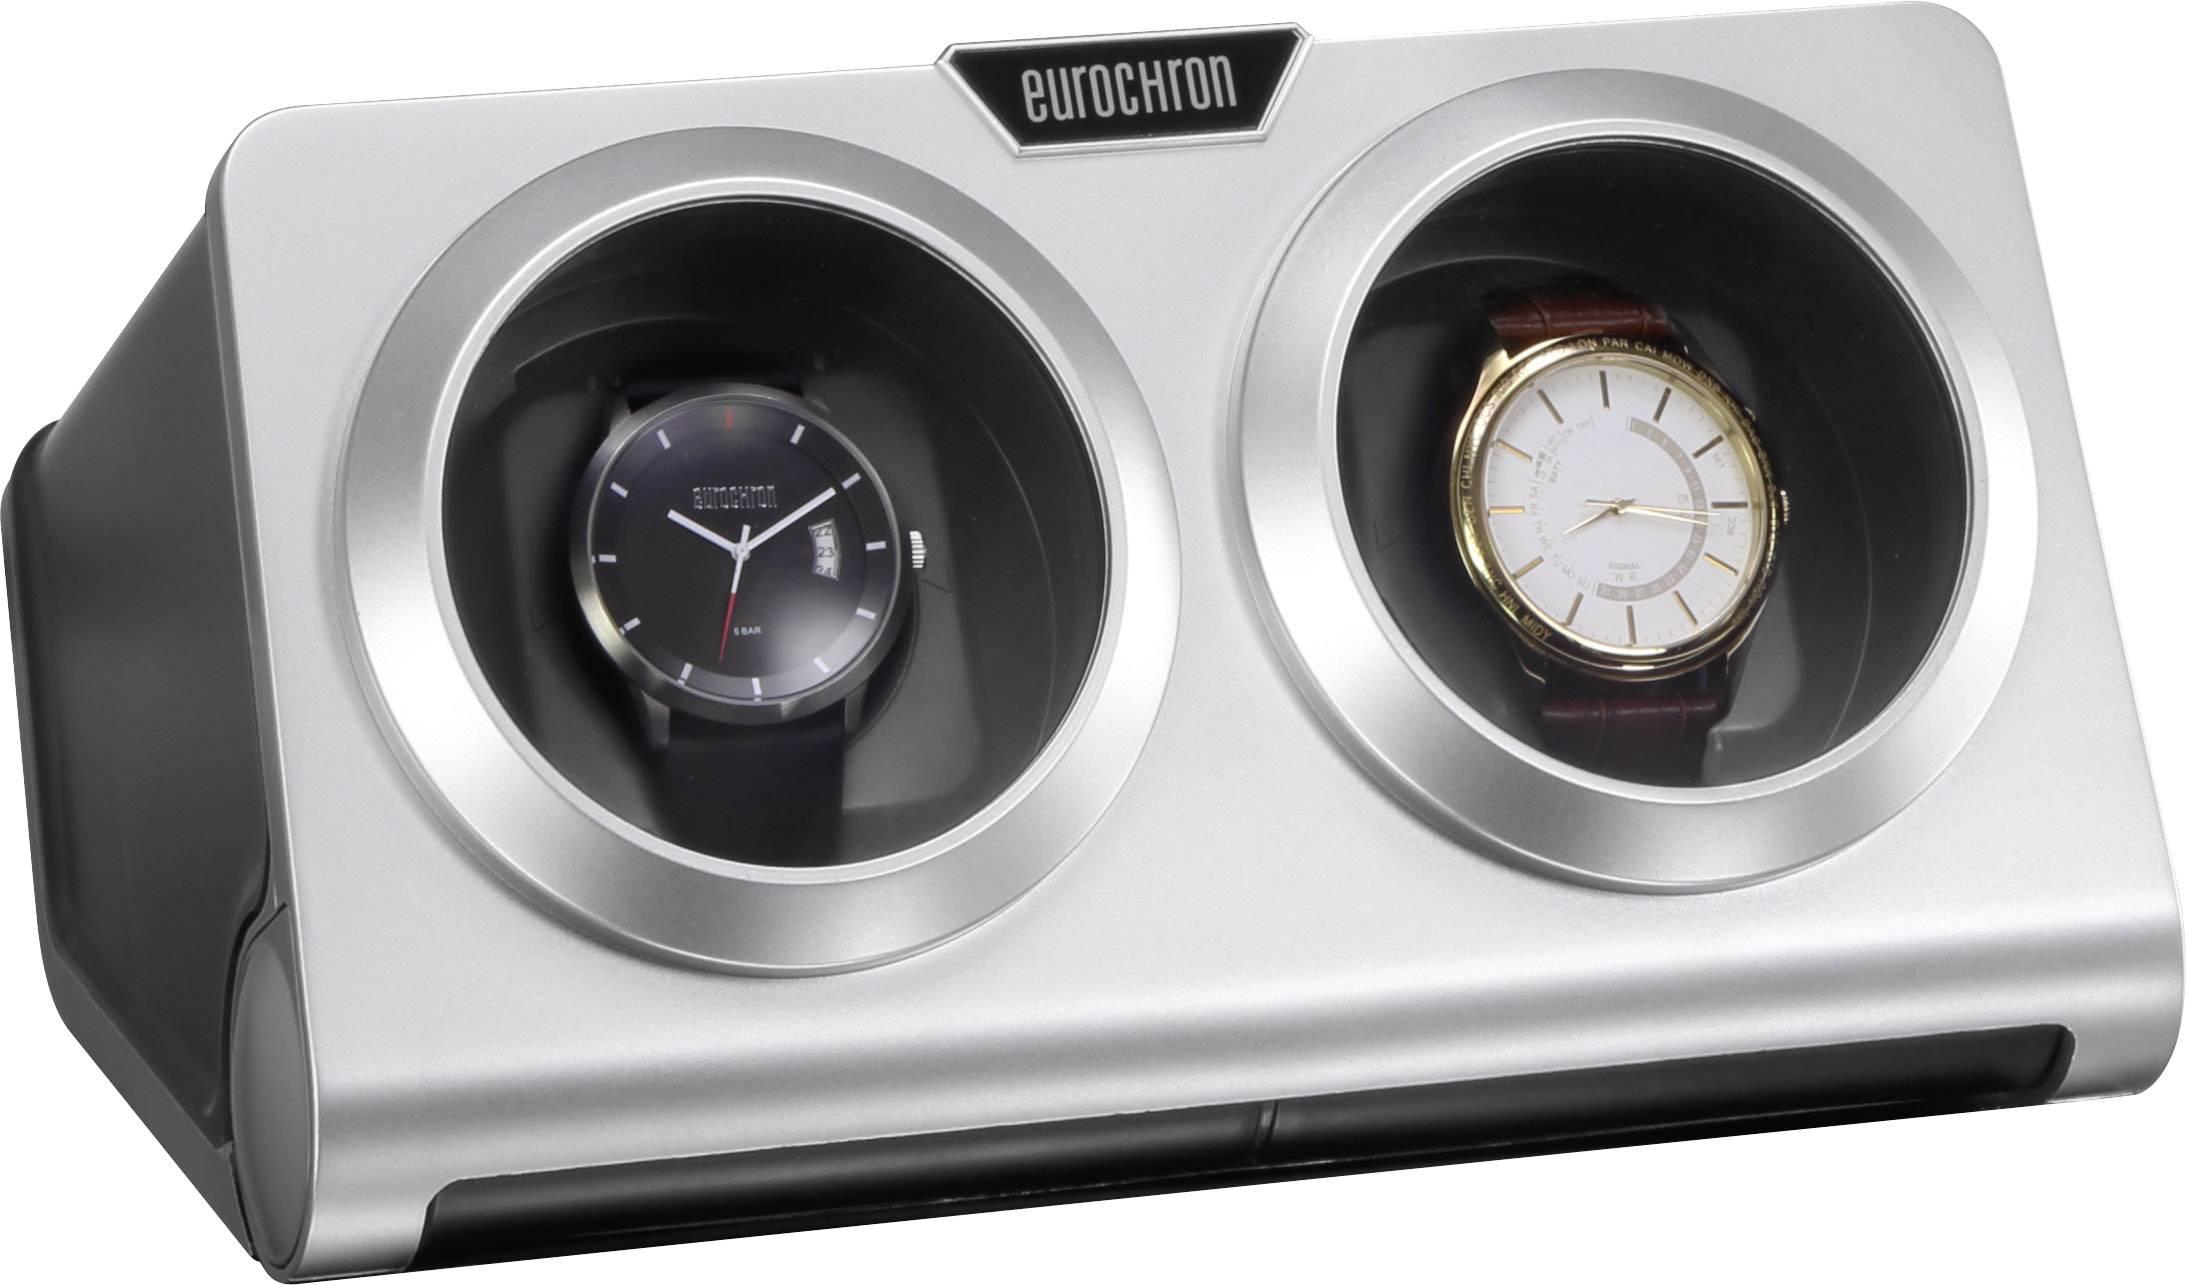 Stojan s natahovačem hodinek Eurochron vhodný pro dvoje hodinky